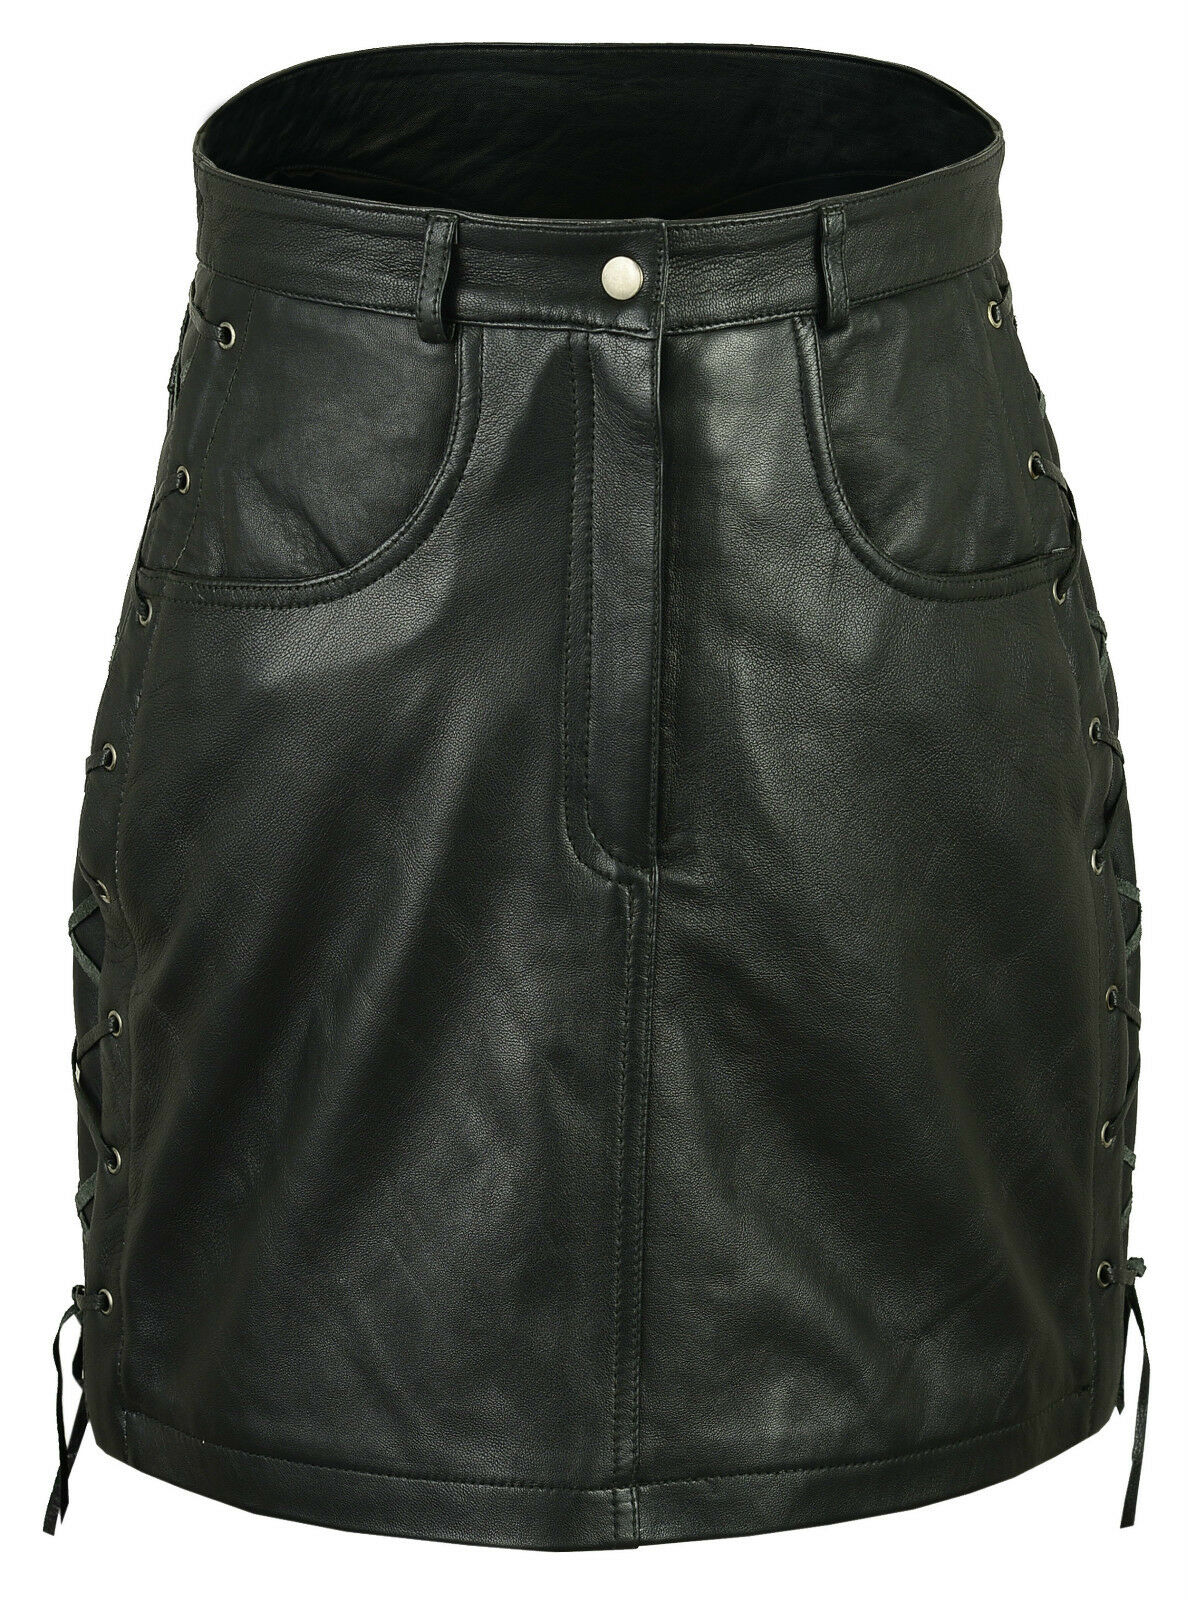 Ladies   Women Soft Nappa Leather Pencil Elegant Dress Skirt - Sides Laces